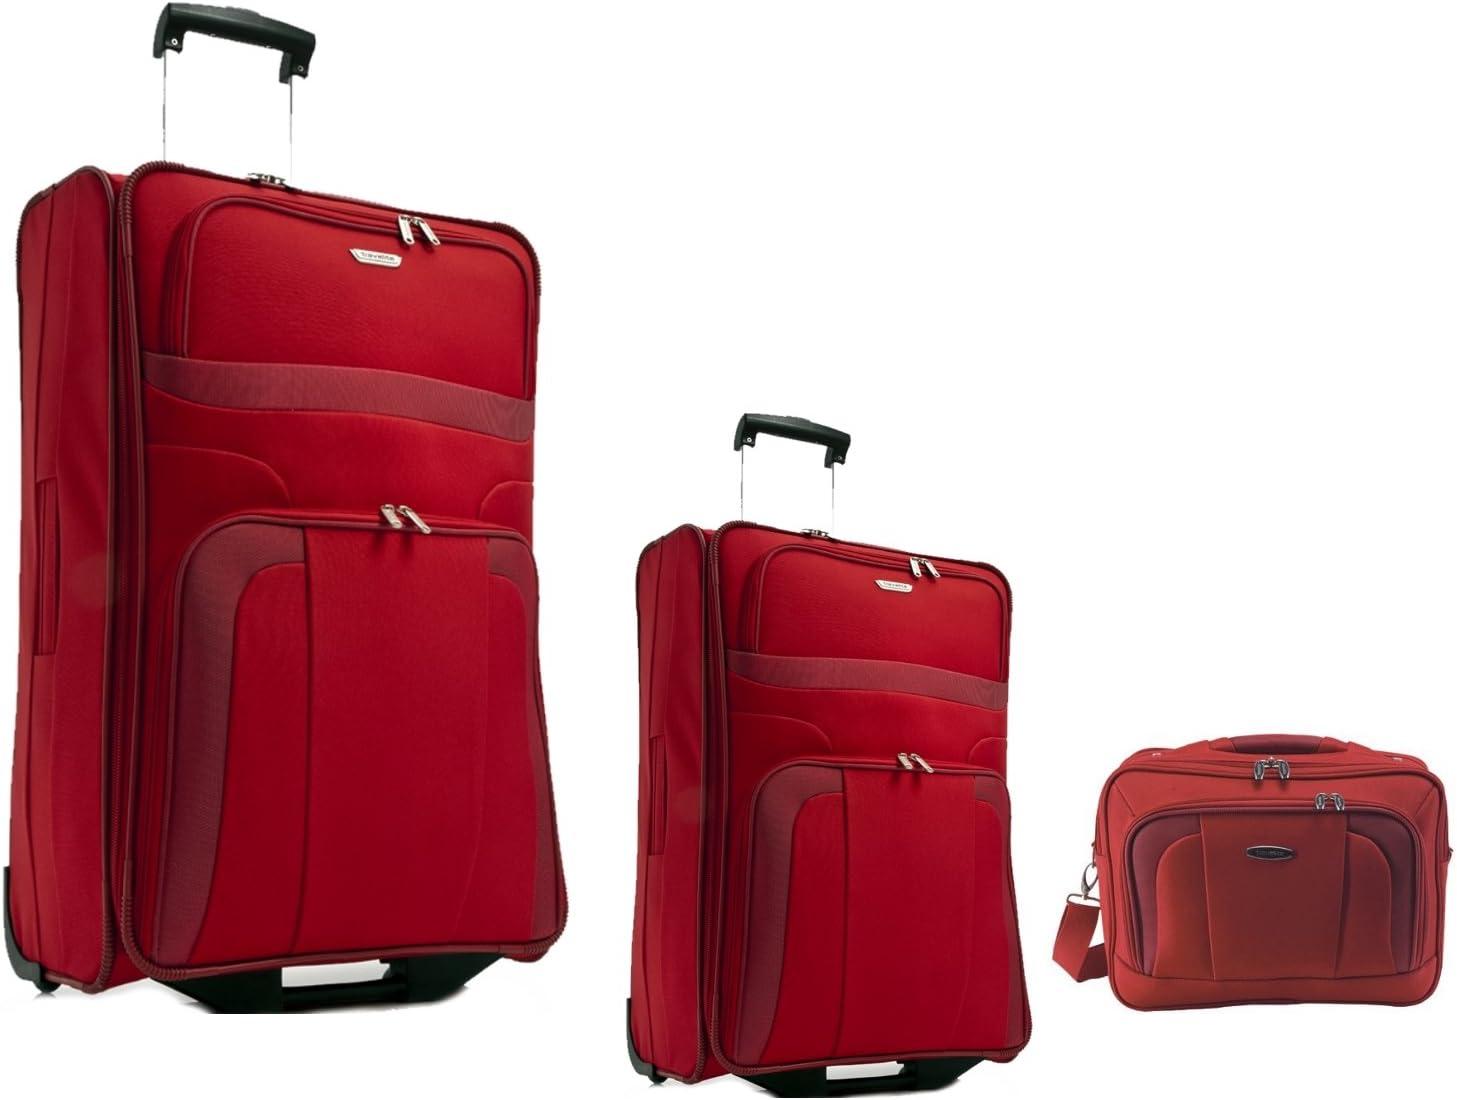 53cm Travelite Koffer Orlando 2-Rad Set 3-teilig: Trolley 63cm Flugbegleiter